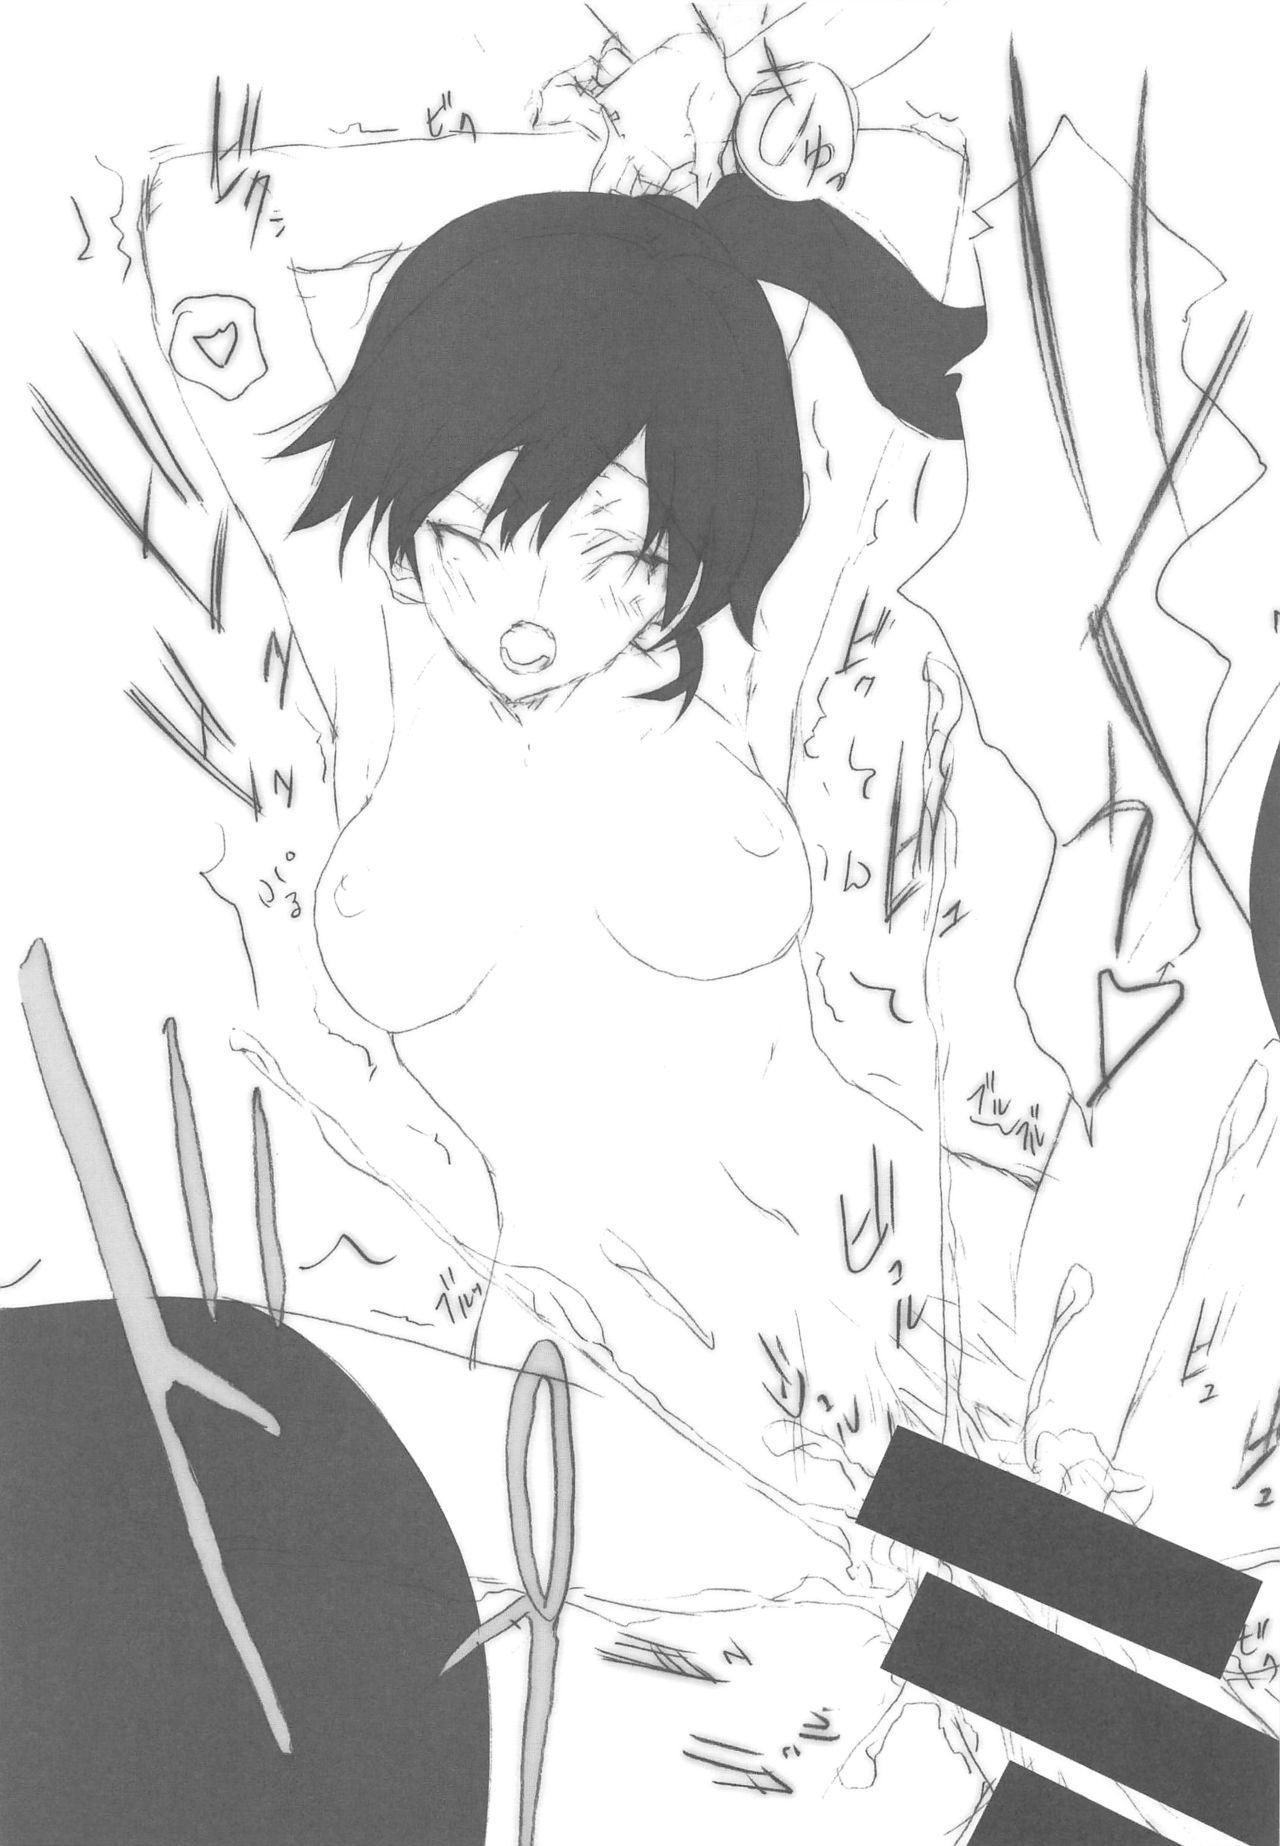 (C85) [Nise-Jyuusyofutei (Nakamura Takeshi)] Hokui 30-do 13-pun 59-byou Seikei 179-do 7-fun 12-byou (Kantai Collection -KanColle-) 23